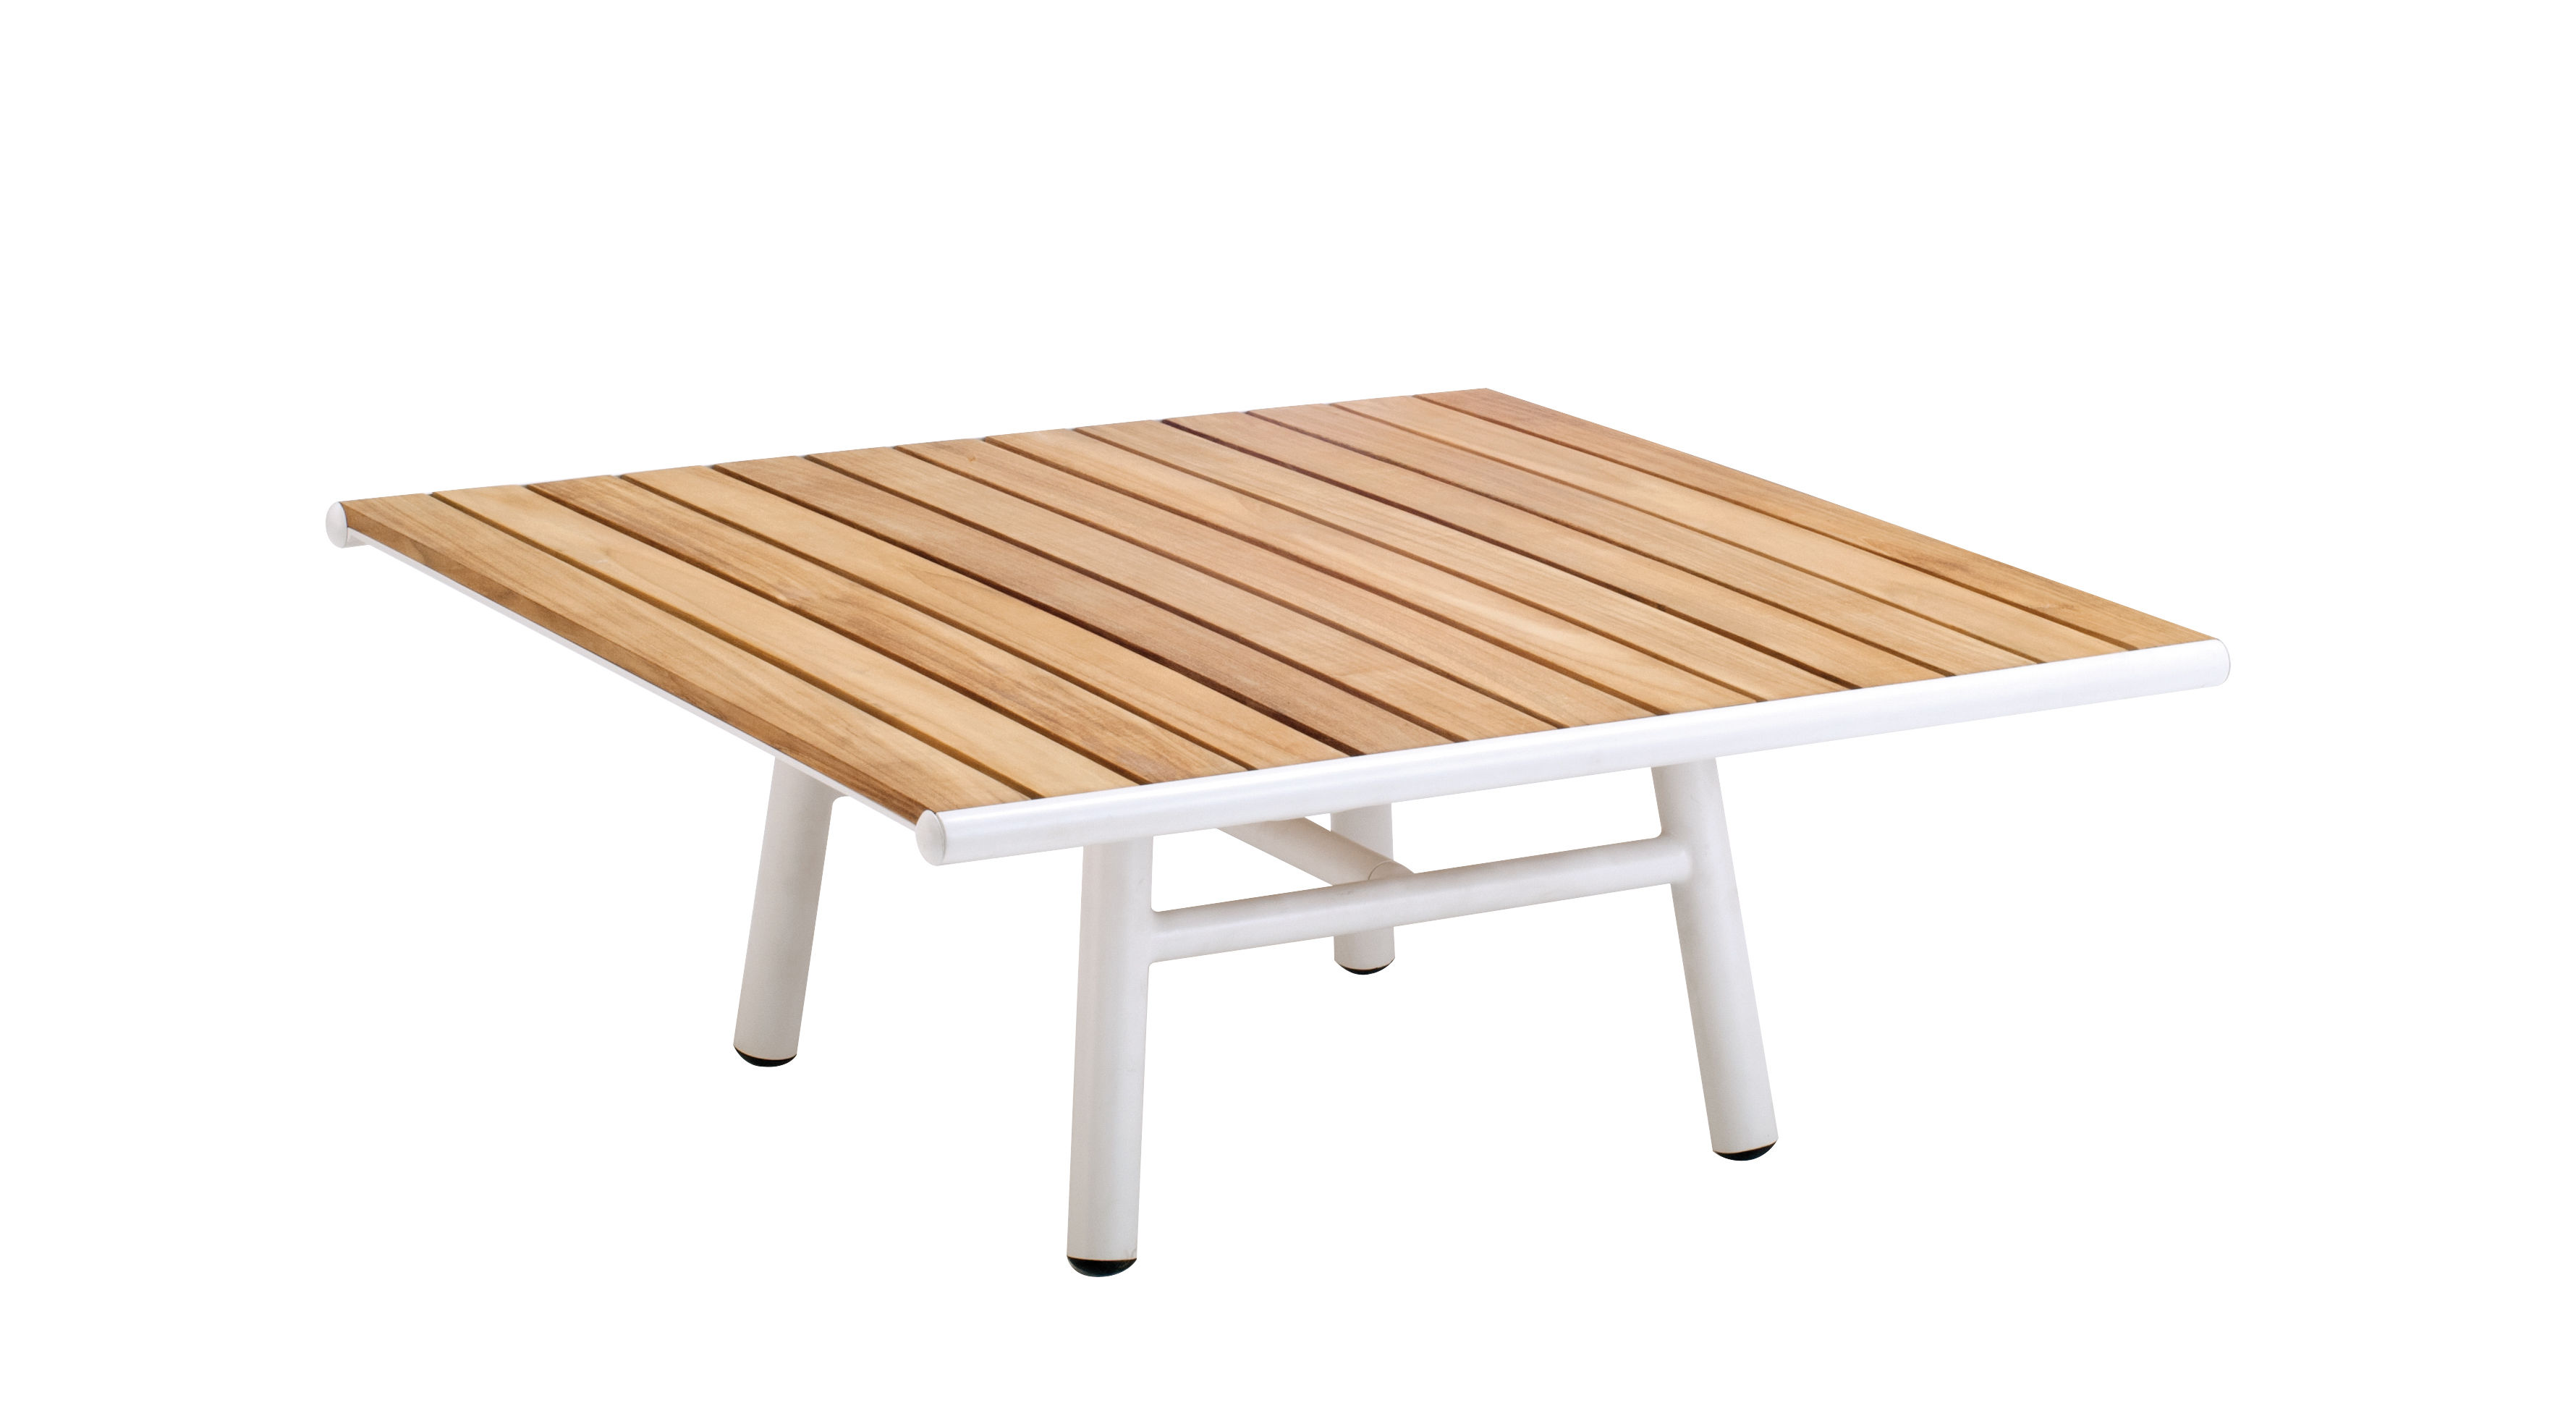 Furniture - Coffee Tables - Pilotis Coffee table - Teak / 100 x 100 cm by Vlaemynck - Teak / White - Lacquered aluminium, Oiled teak